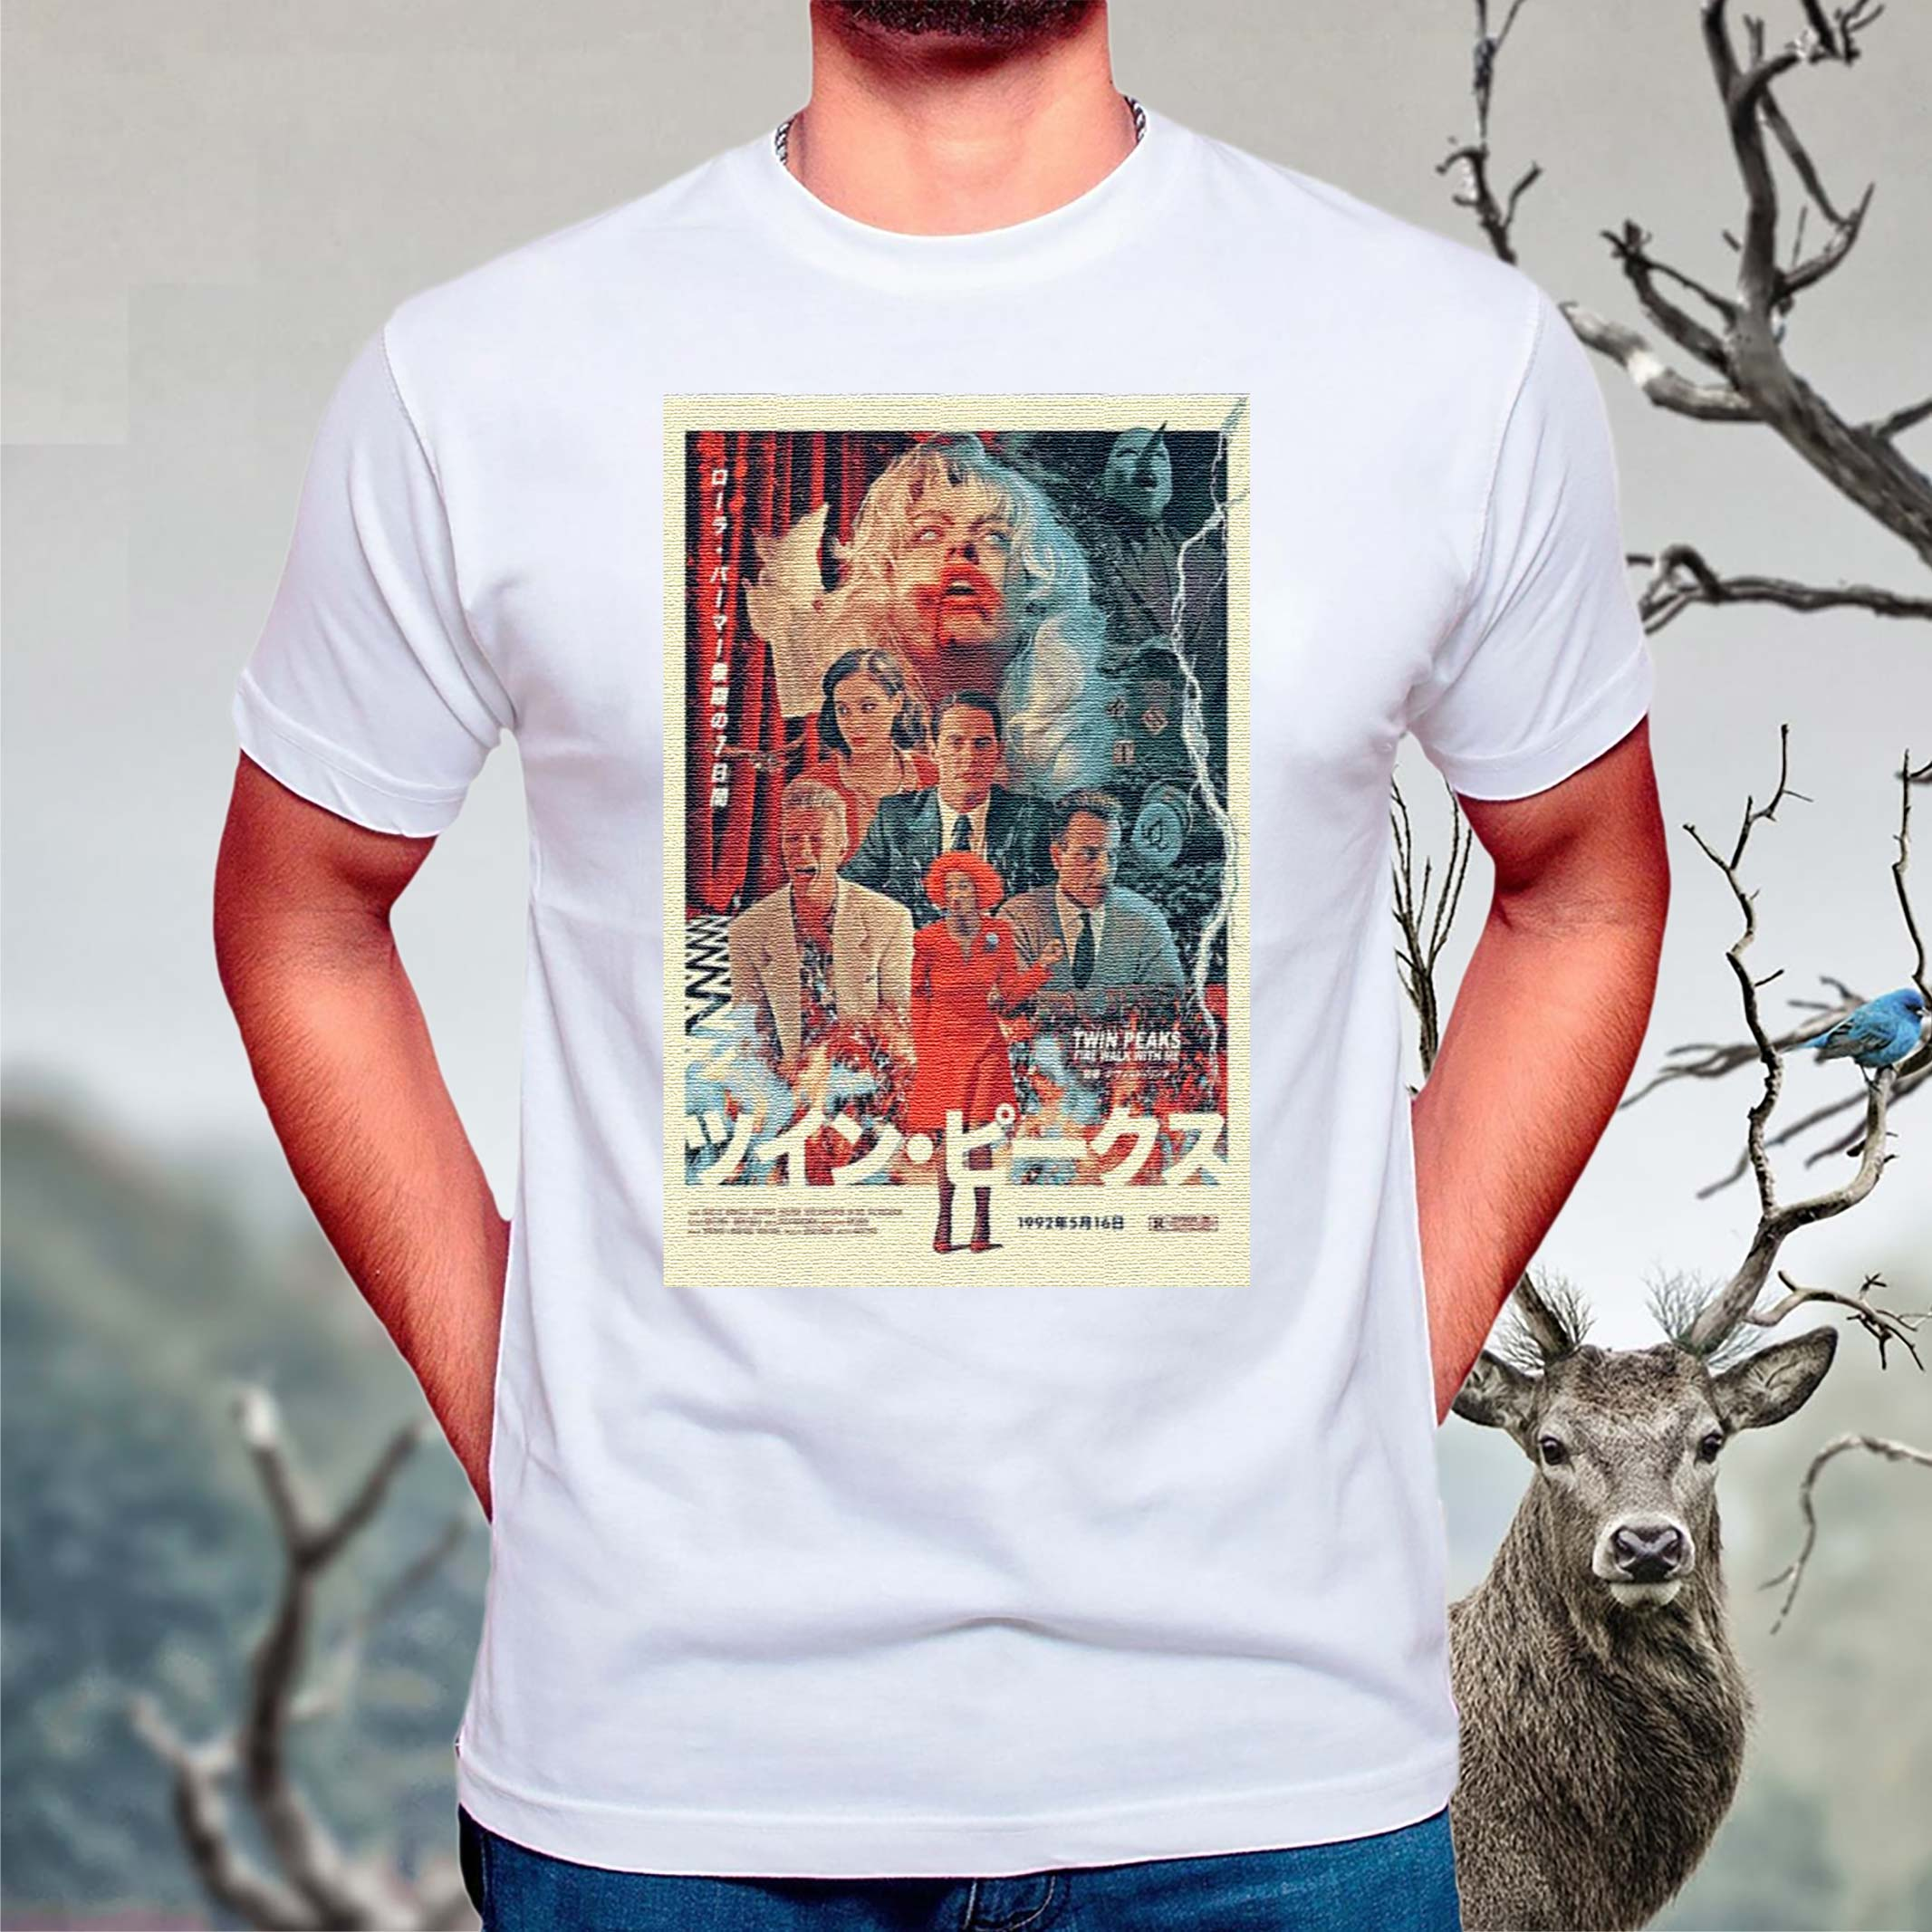 Twin-Peaks-Fire-Walk-With-Me-T-Shirt